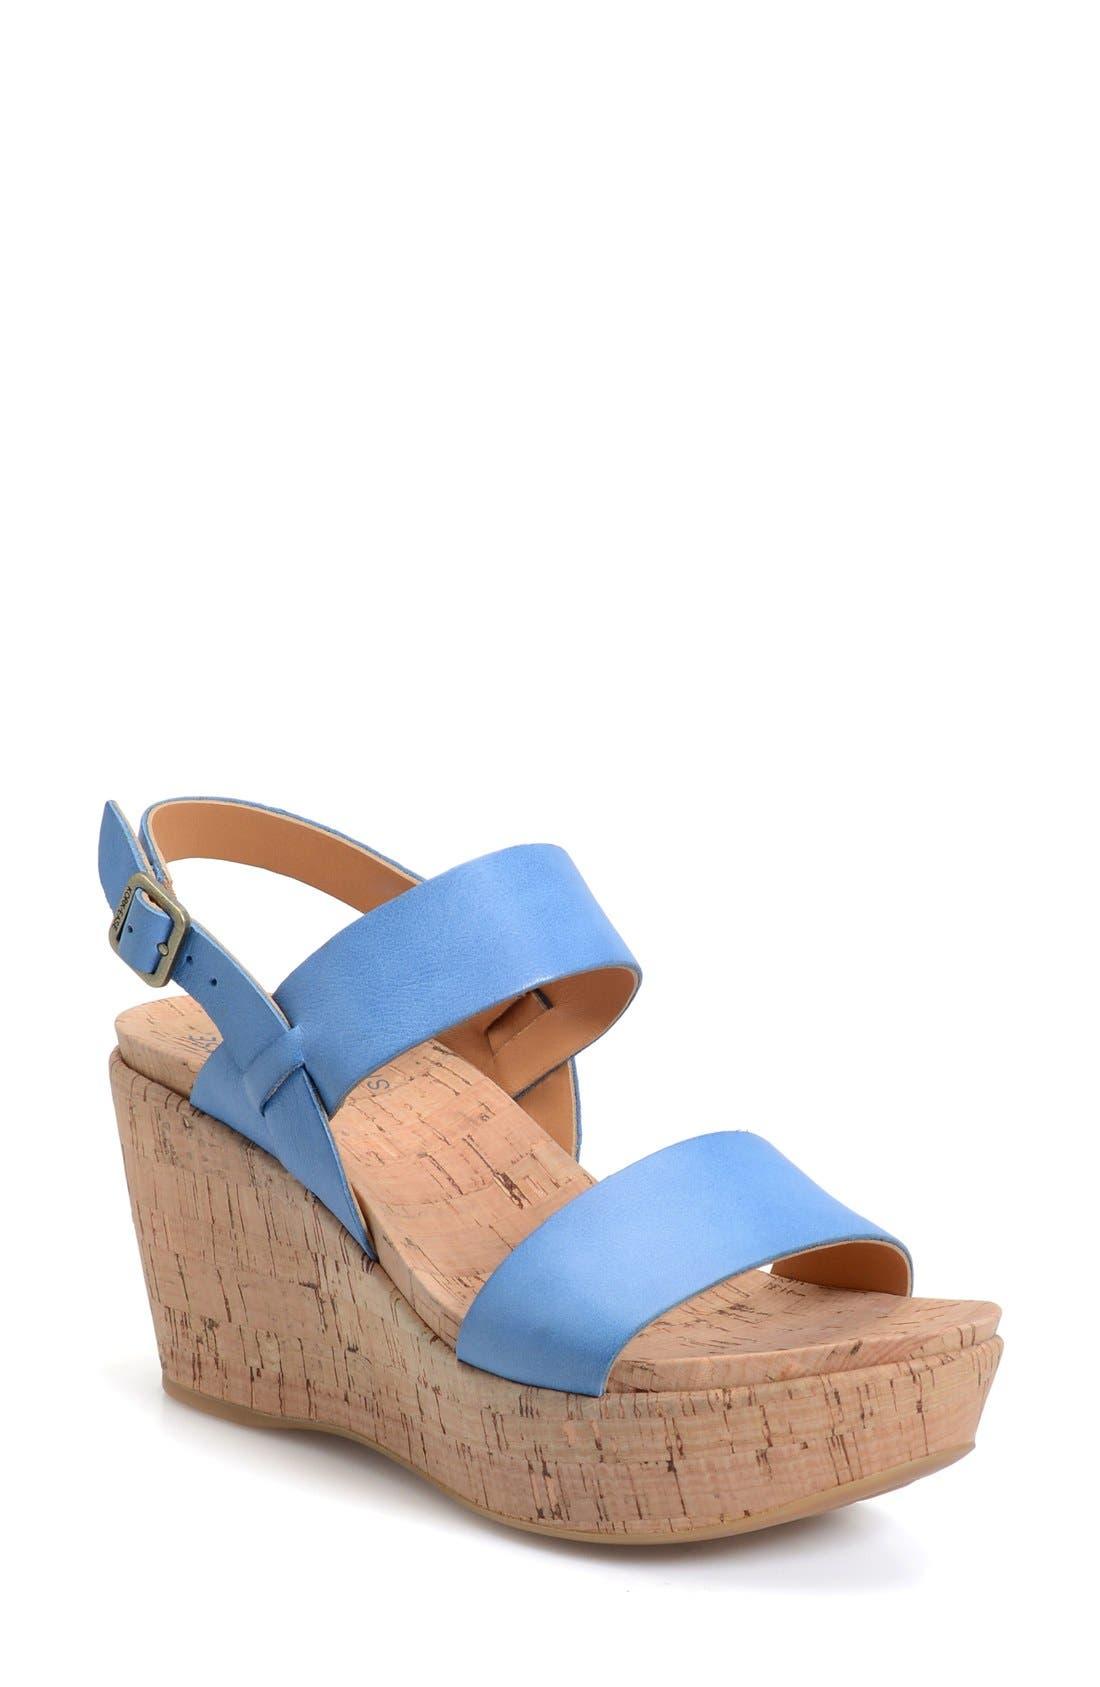 'Austin' Slingback Wedge Sandal,                             Main thumbnail 7, color,